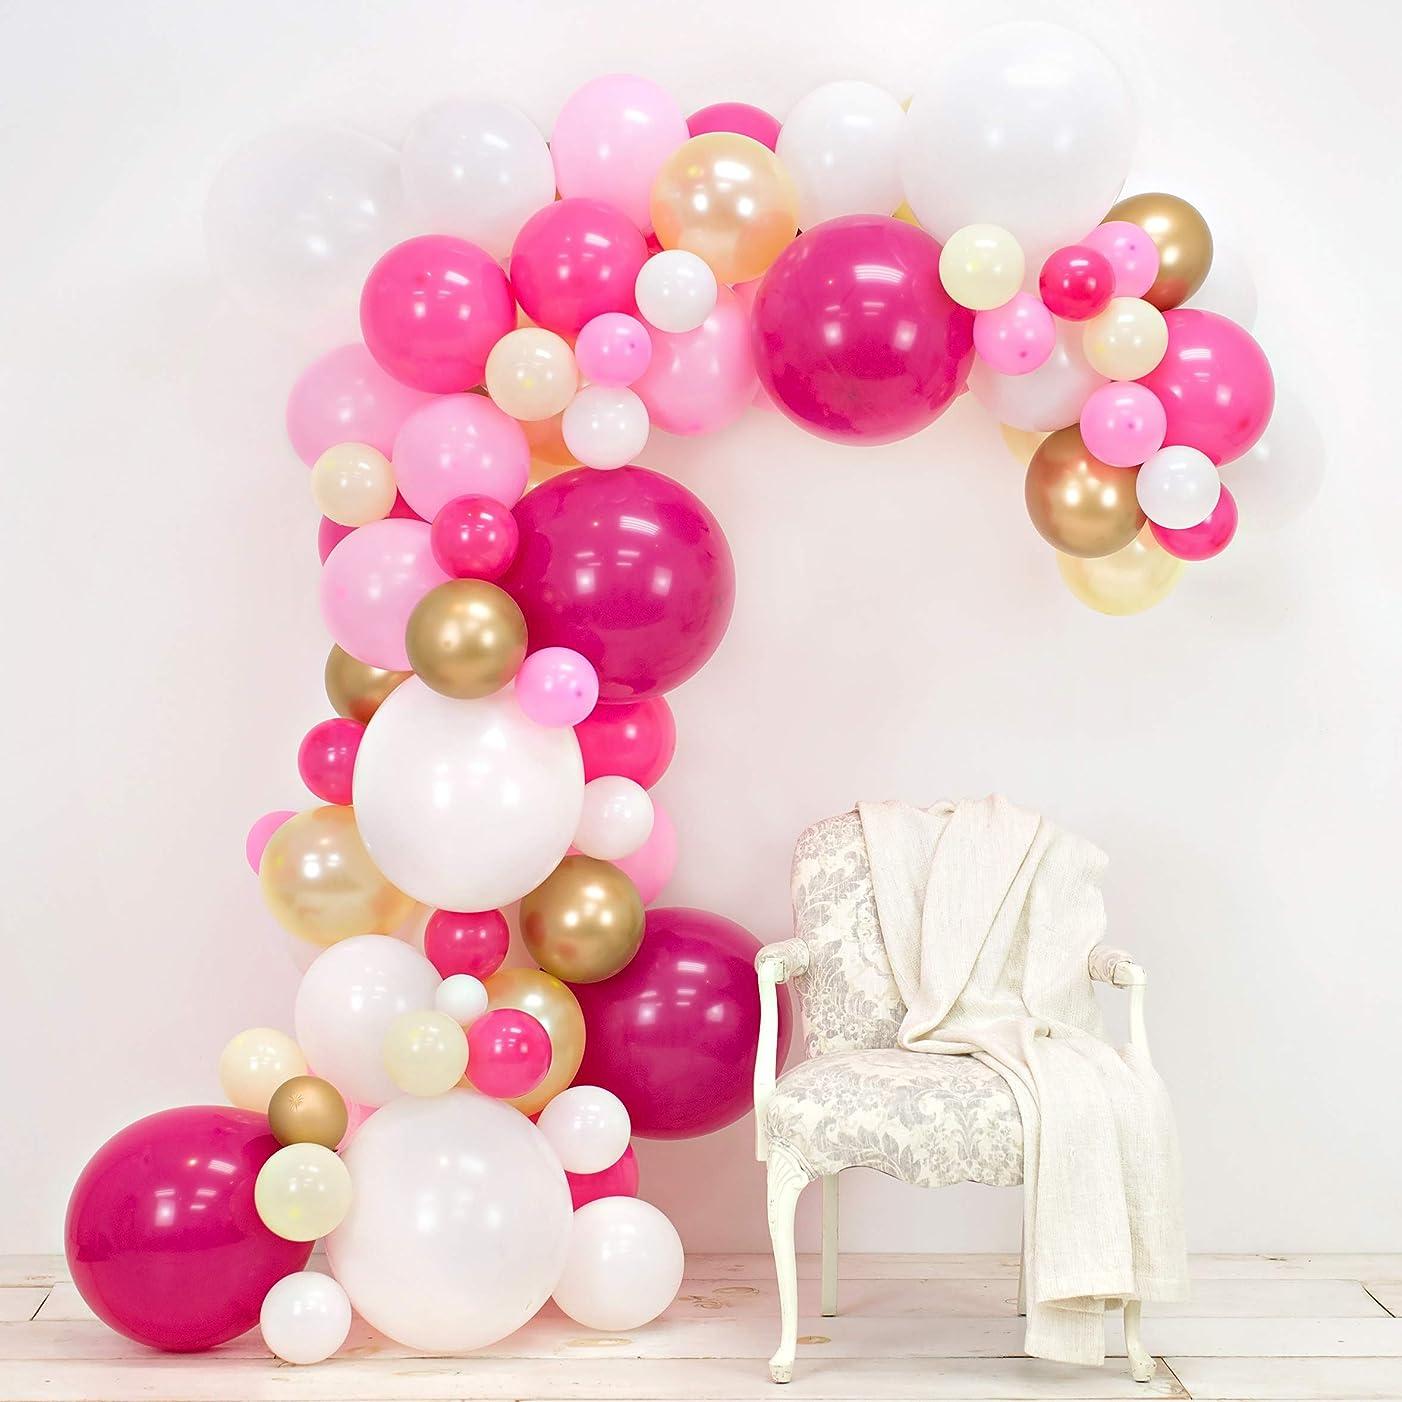 JUNIBEL Balloon Arch & Garland Kit | Fuchsia, Pink, Chrome Gold, White & Pastel Yellow | Glue Dots & Decorating Strip | Holiday, Wedding, Baby Shower, Graduation, Anniversary & Party Decorations